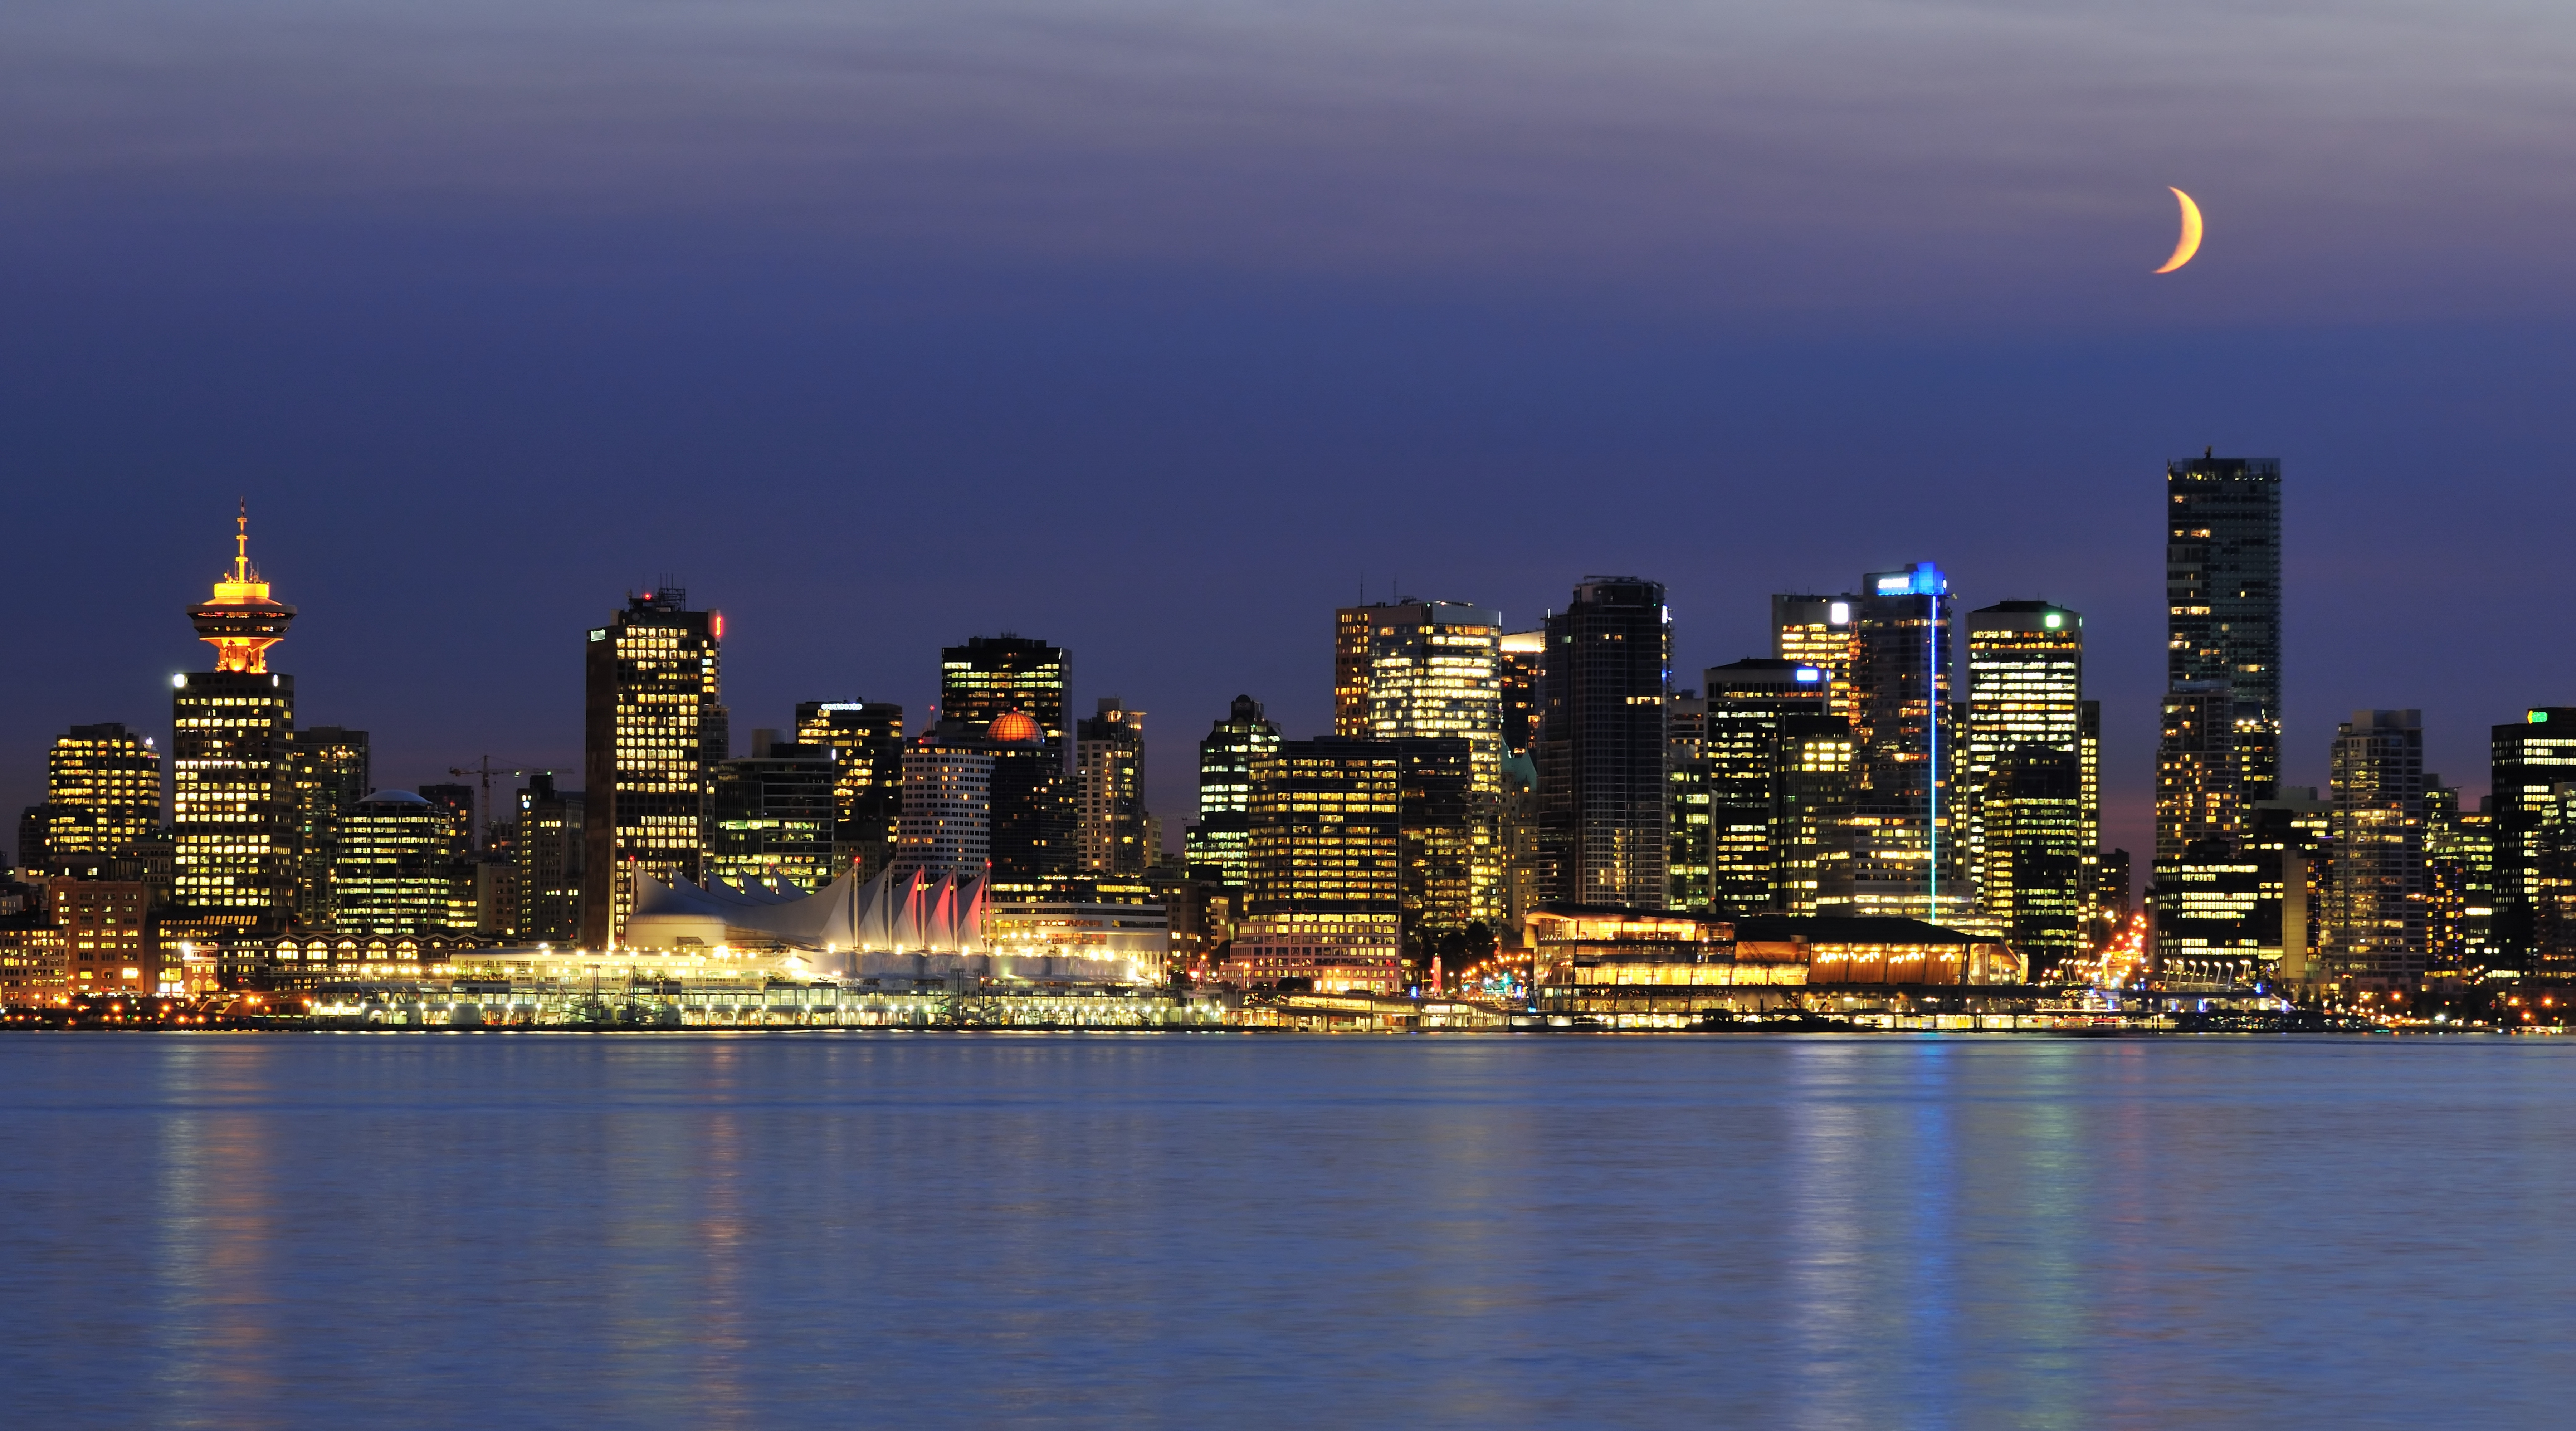 4K wallpaper   City   night Ocean skyscrapers lights moon city 7200x4000